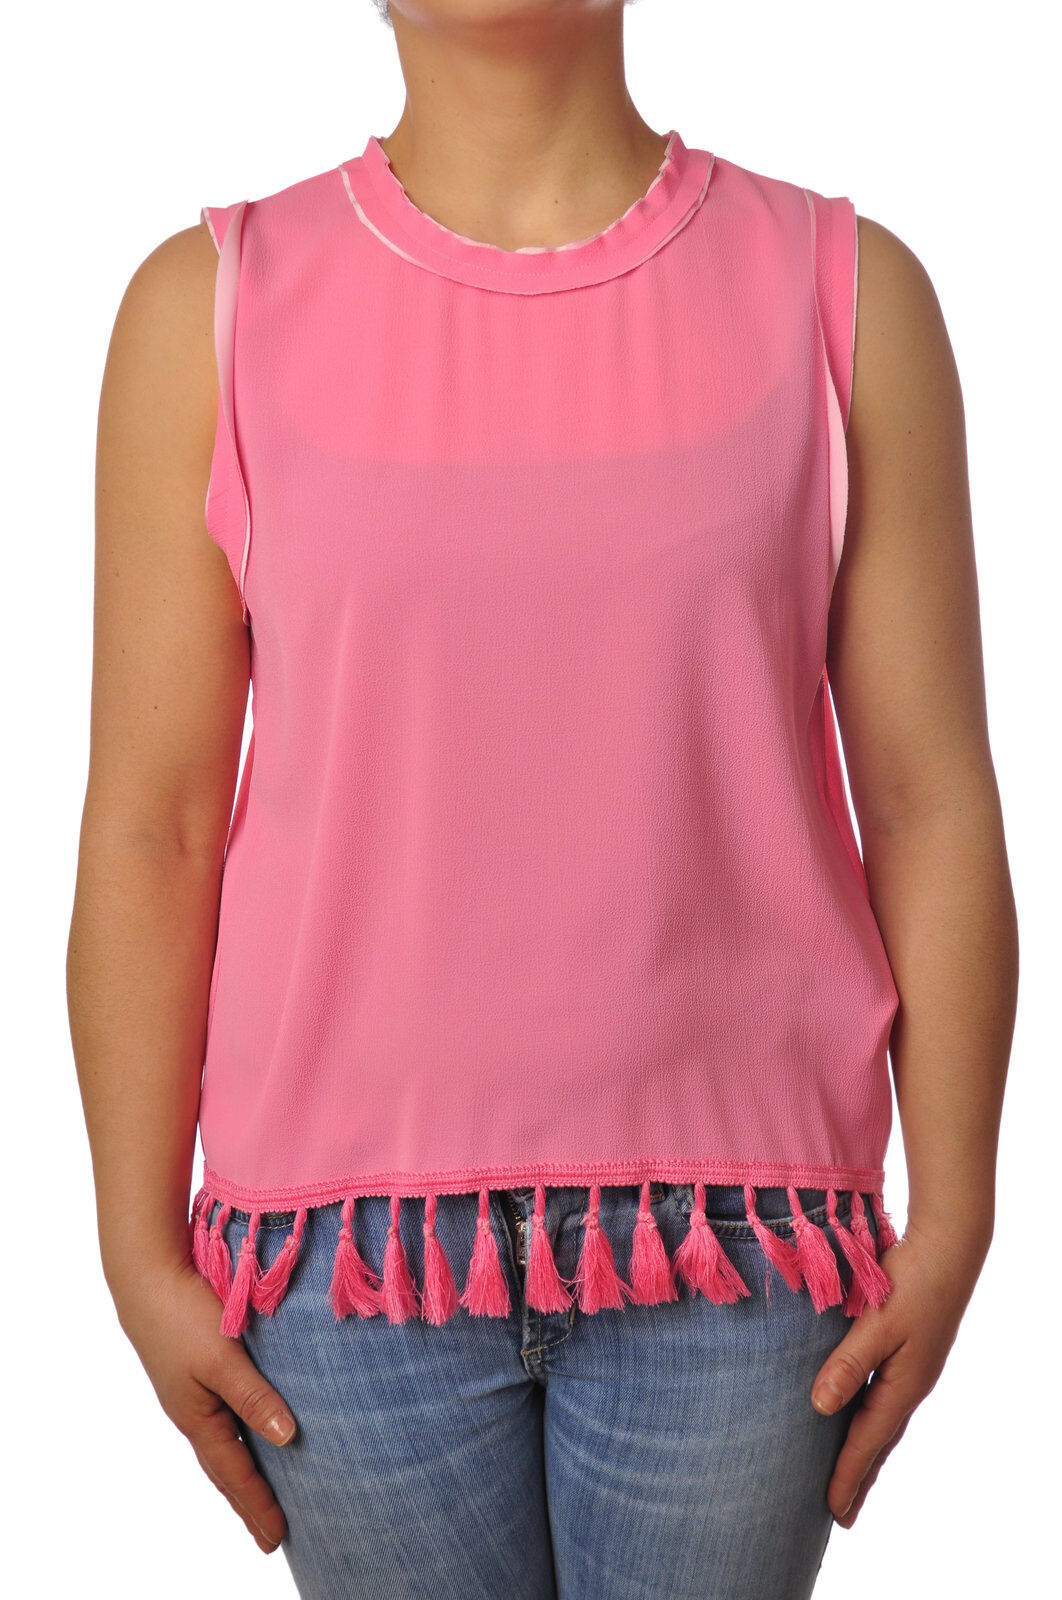 Traffic People - Topwear-Sleeveless Top - Woman - Rosa - 5110616C184321